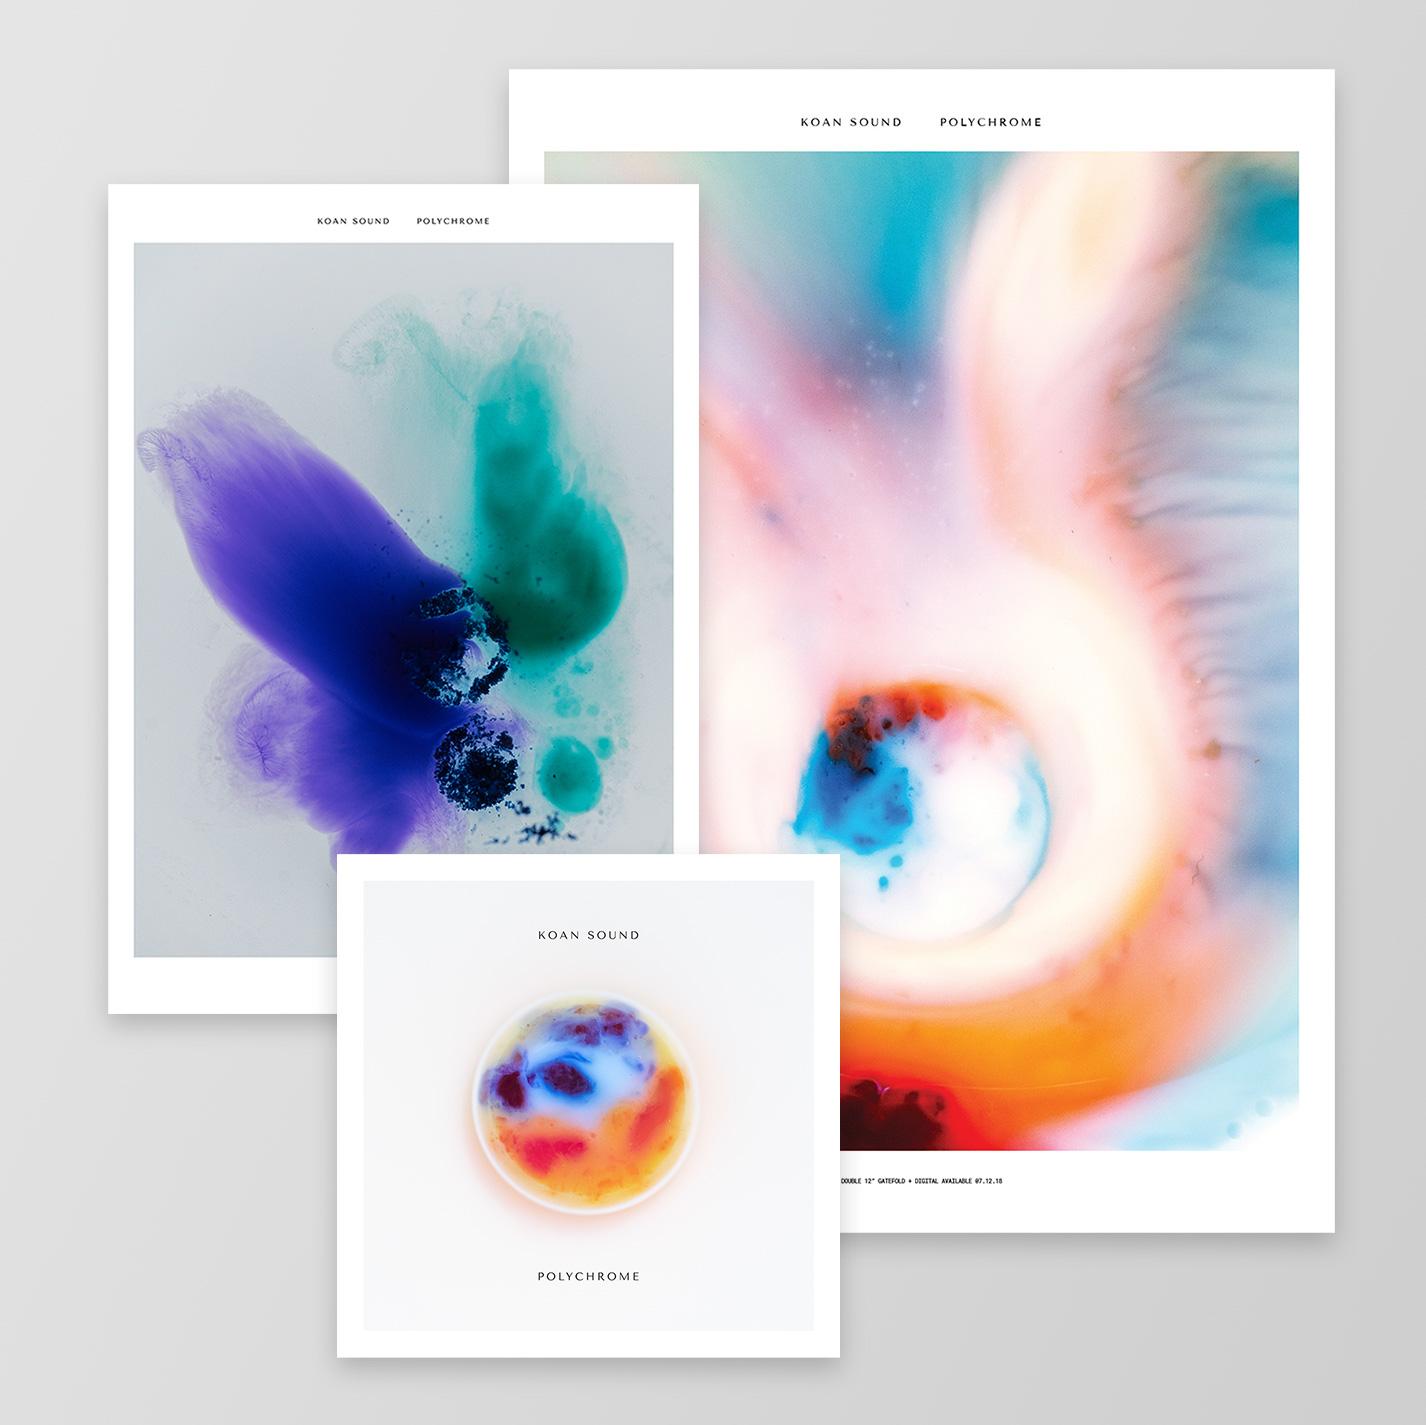 Polychrome Double LP + A2 Poster + A3 Poster - KOAN Sound USD